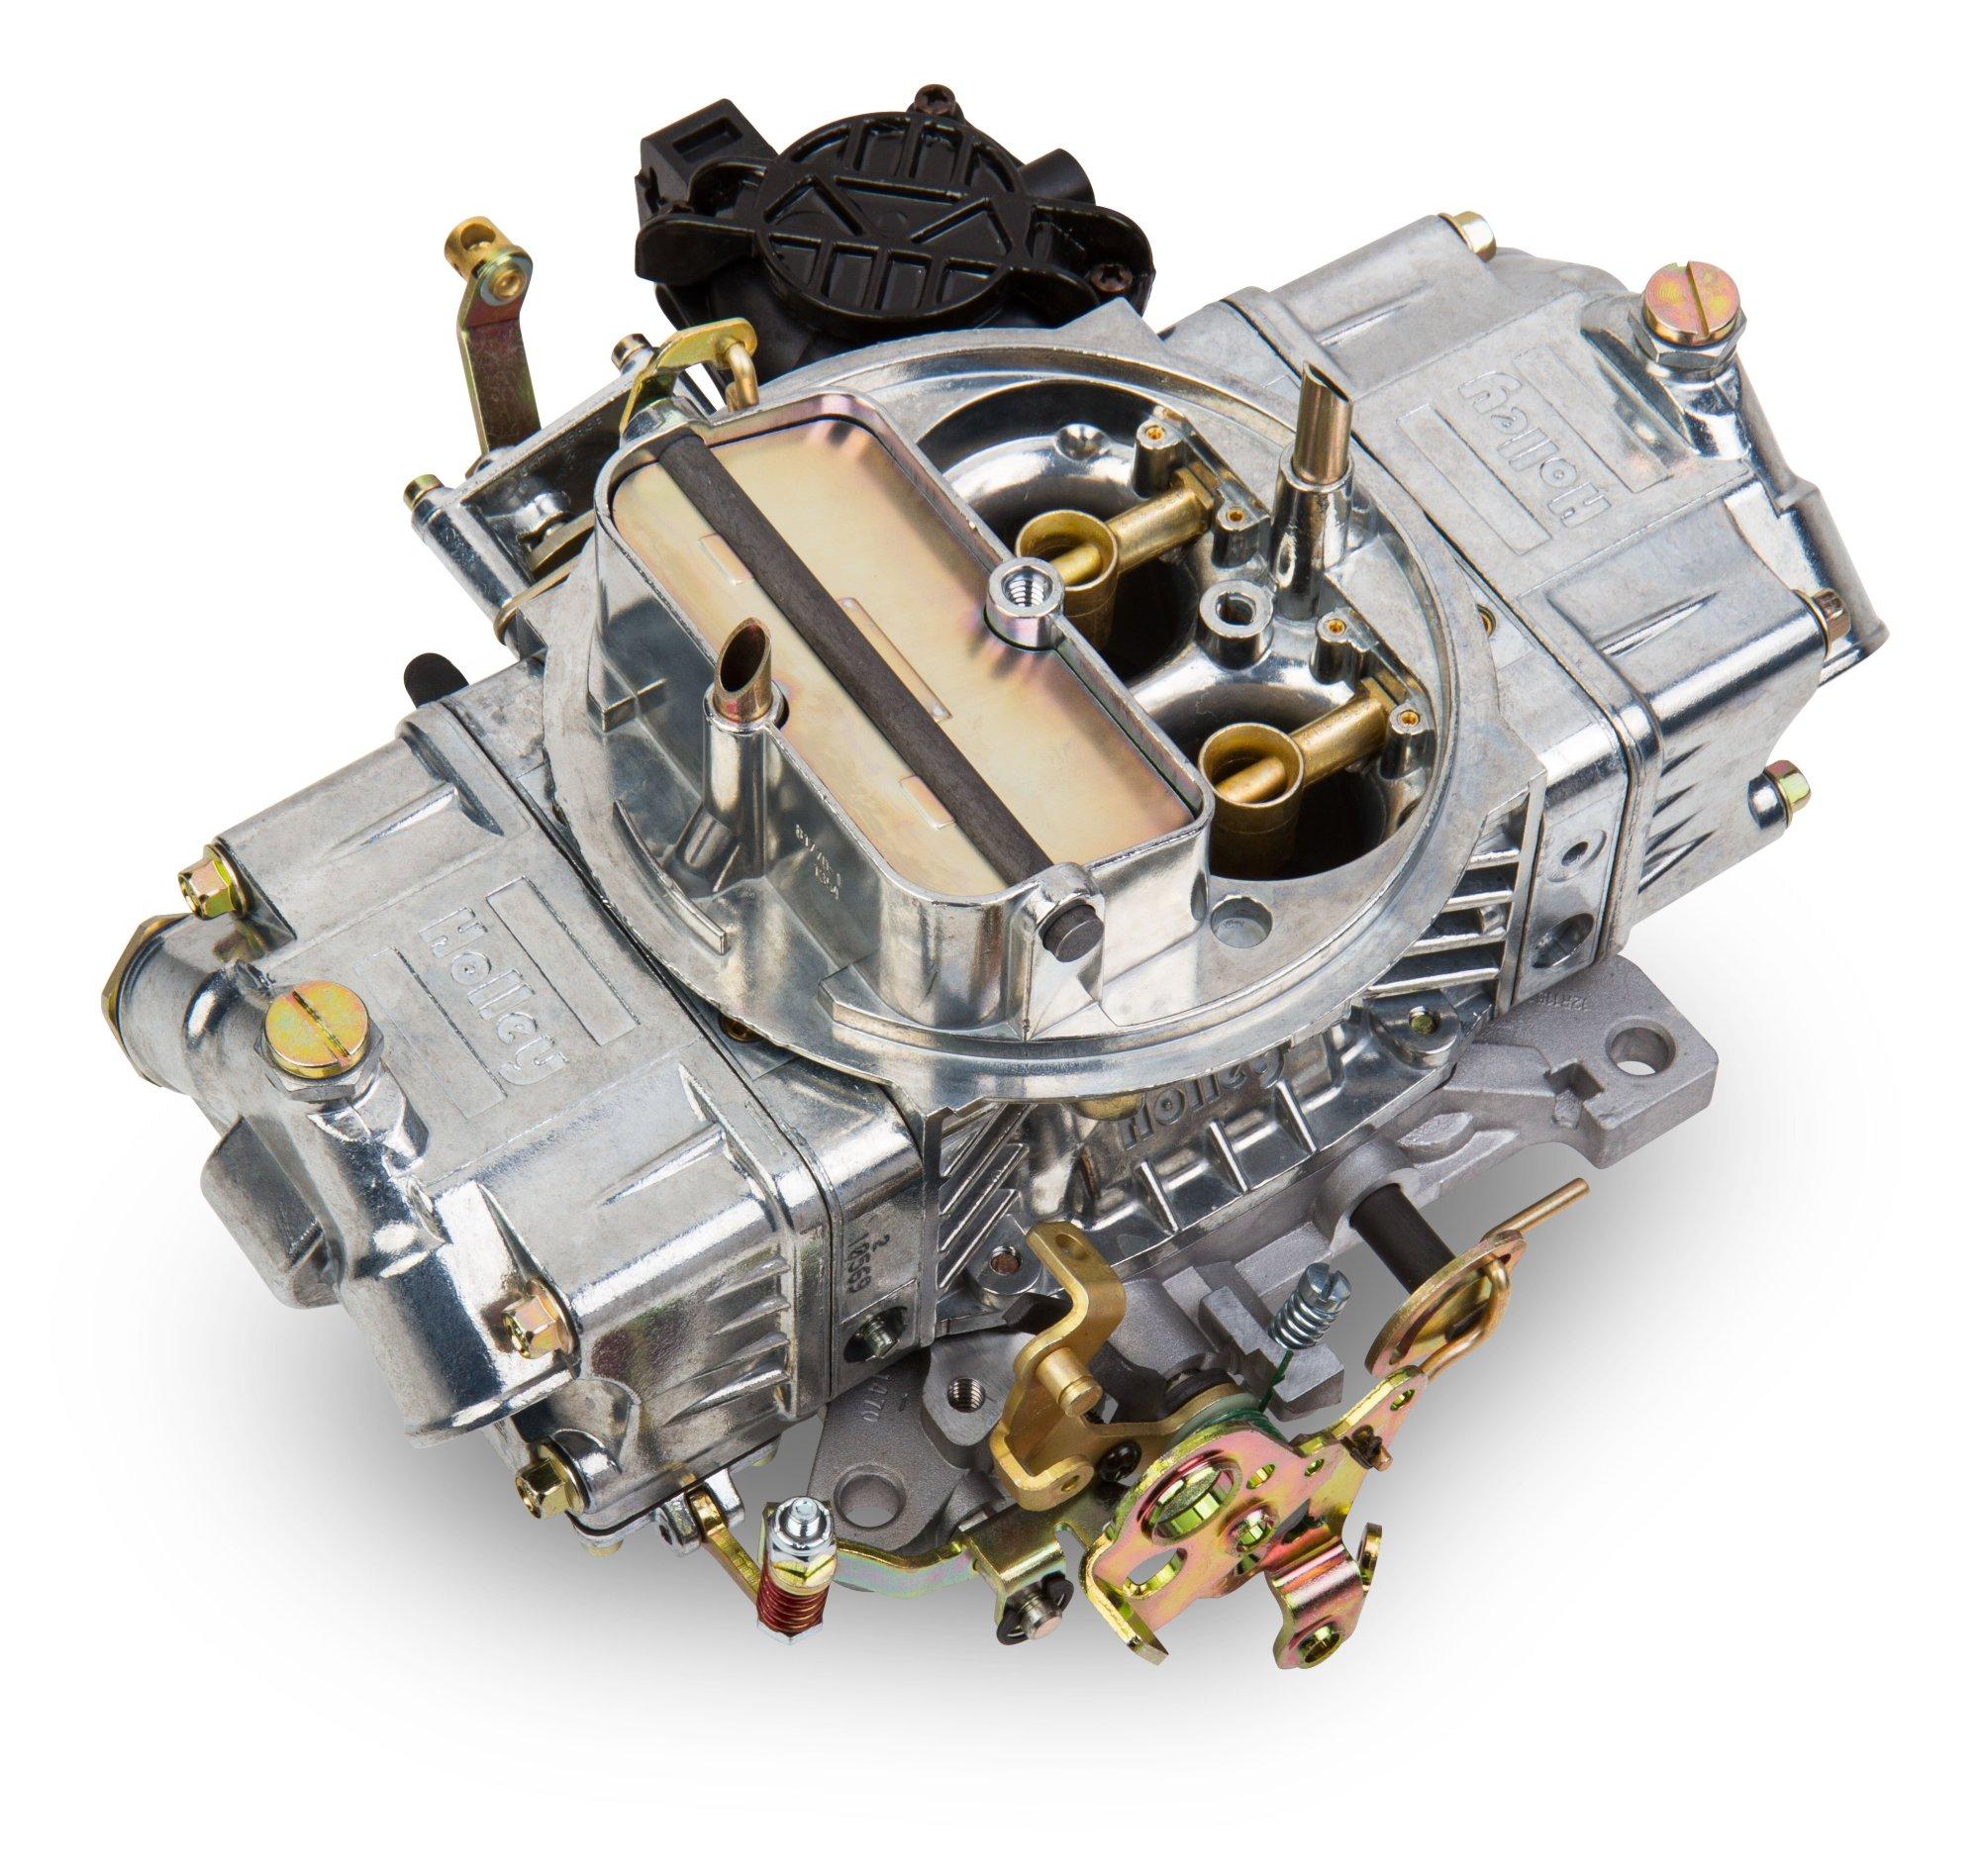 hight resolution of 0 81770 770 cfm street avenger carburetor image